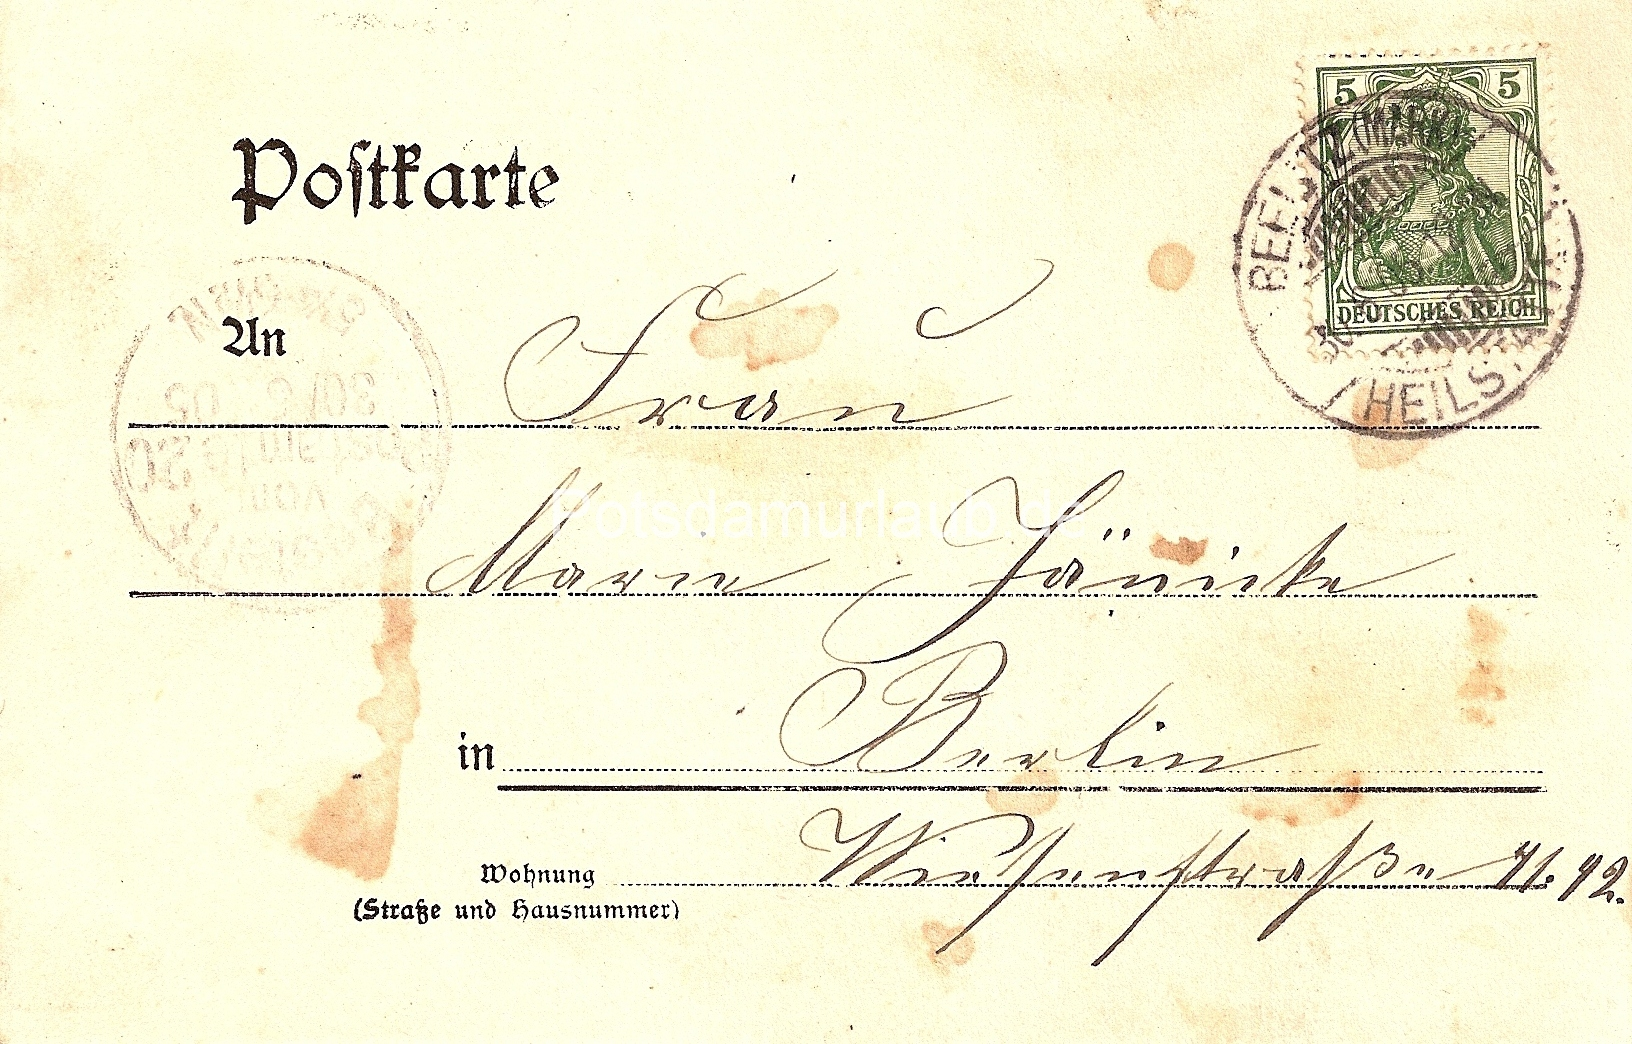 1905 06 30